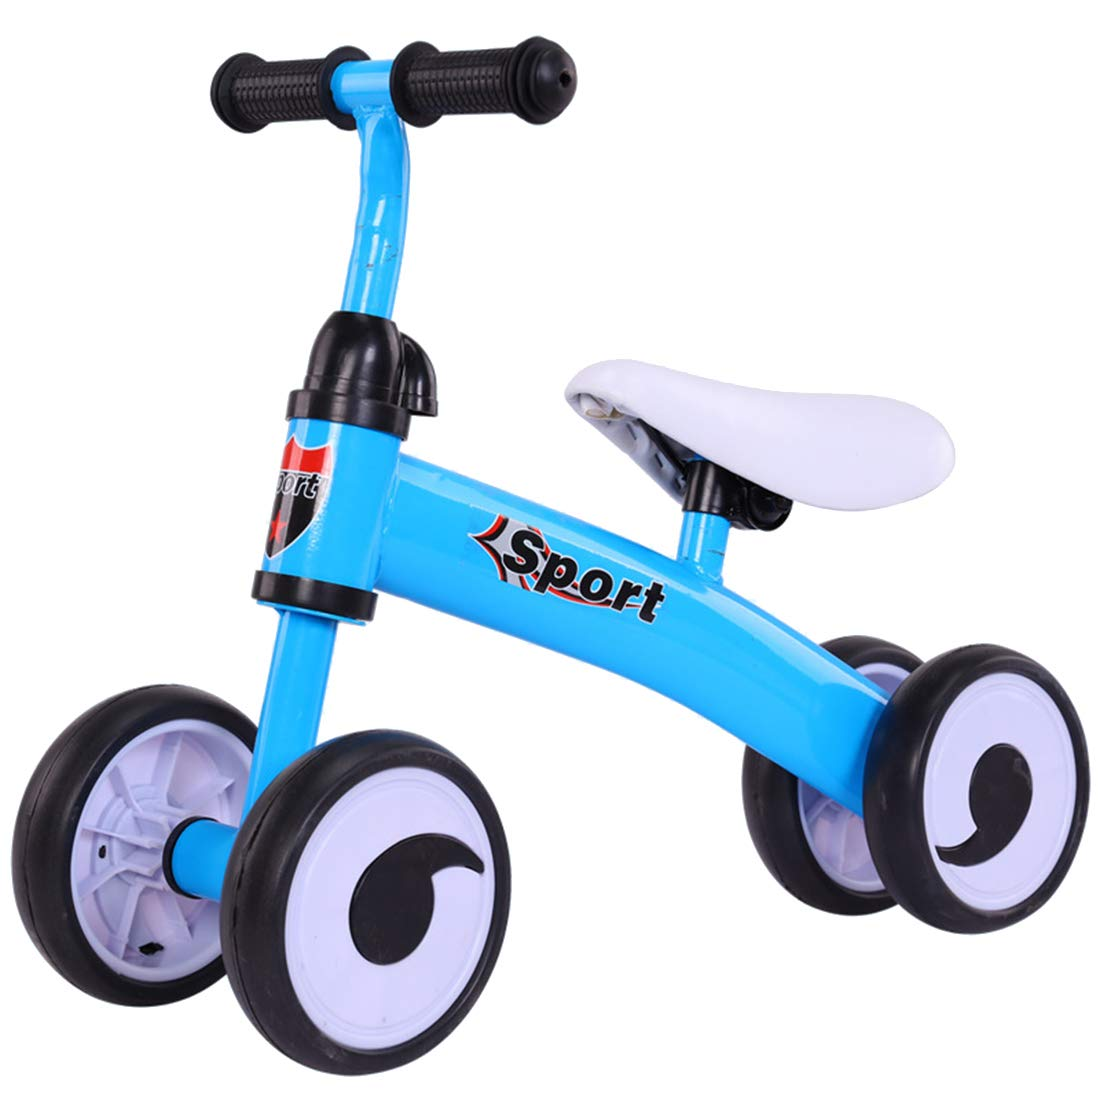 blueee OneSize GRXXX KinderVierradBalance Car Slide Car ohne Pedal Roller Spielzeugauto 13 Jahre alt,blueeeOneSize